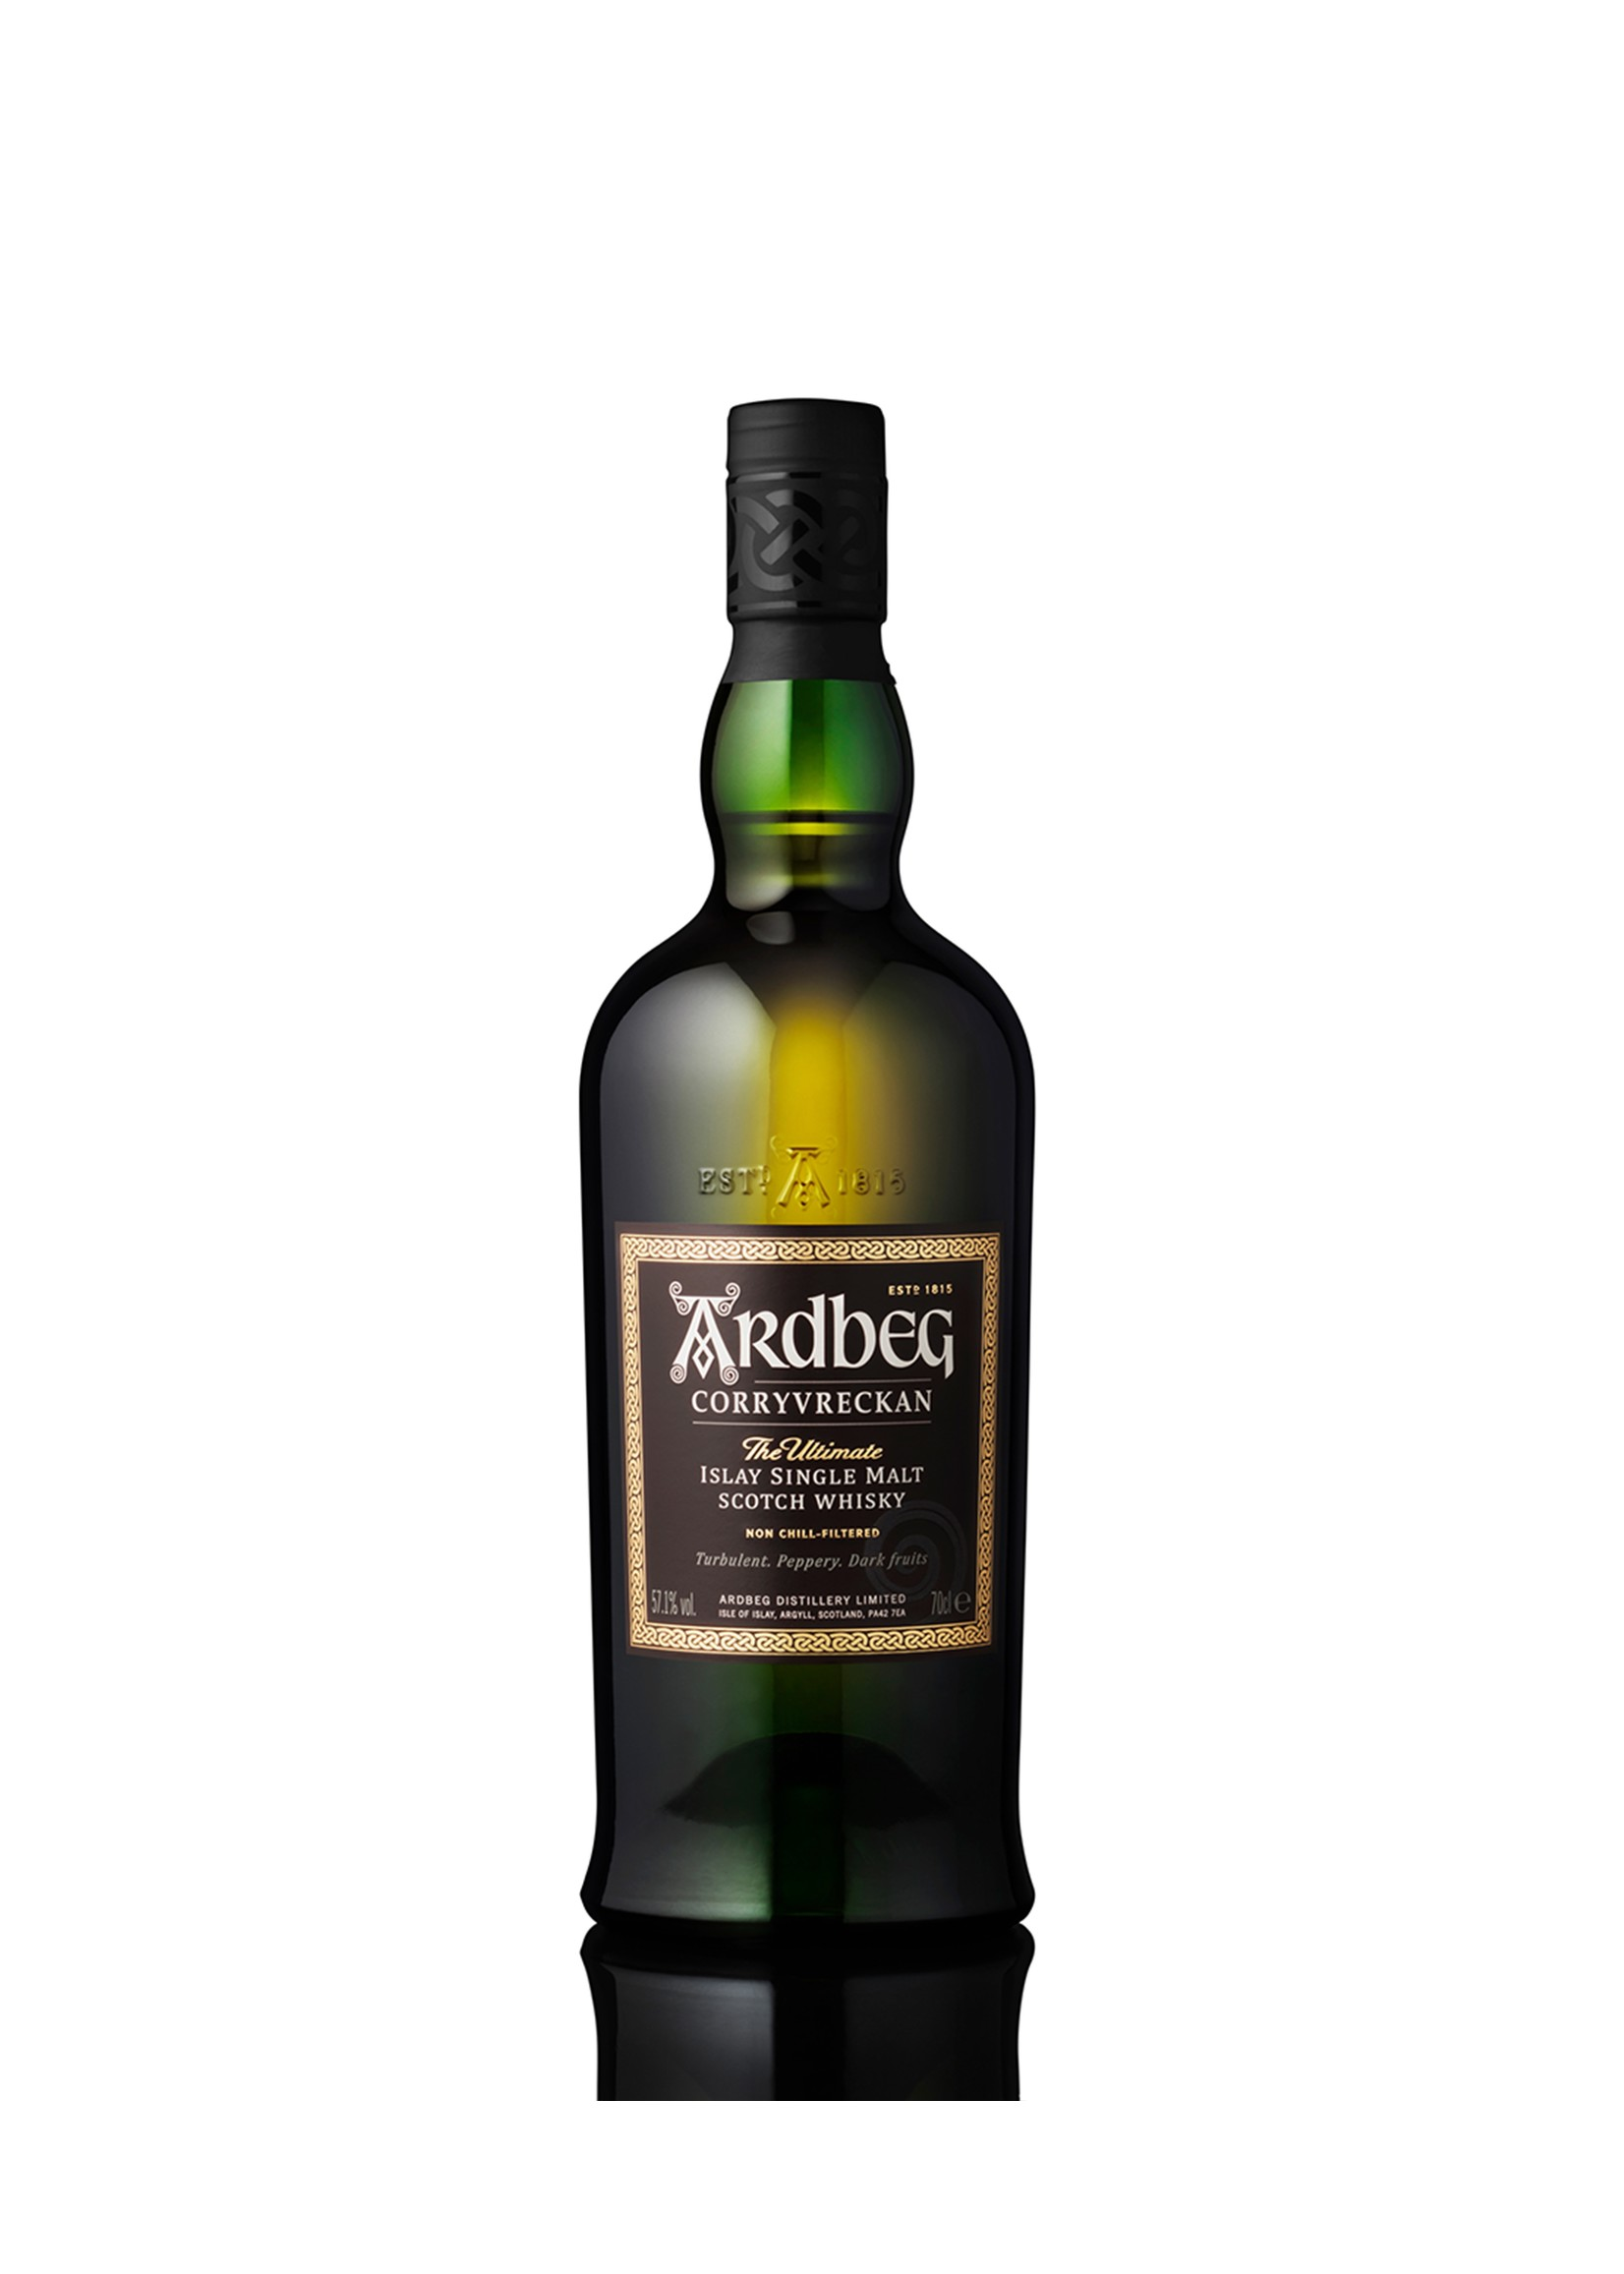 ARDBEG Ardbeg / Scotch Single Malt / Corryvreckan / 750mL